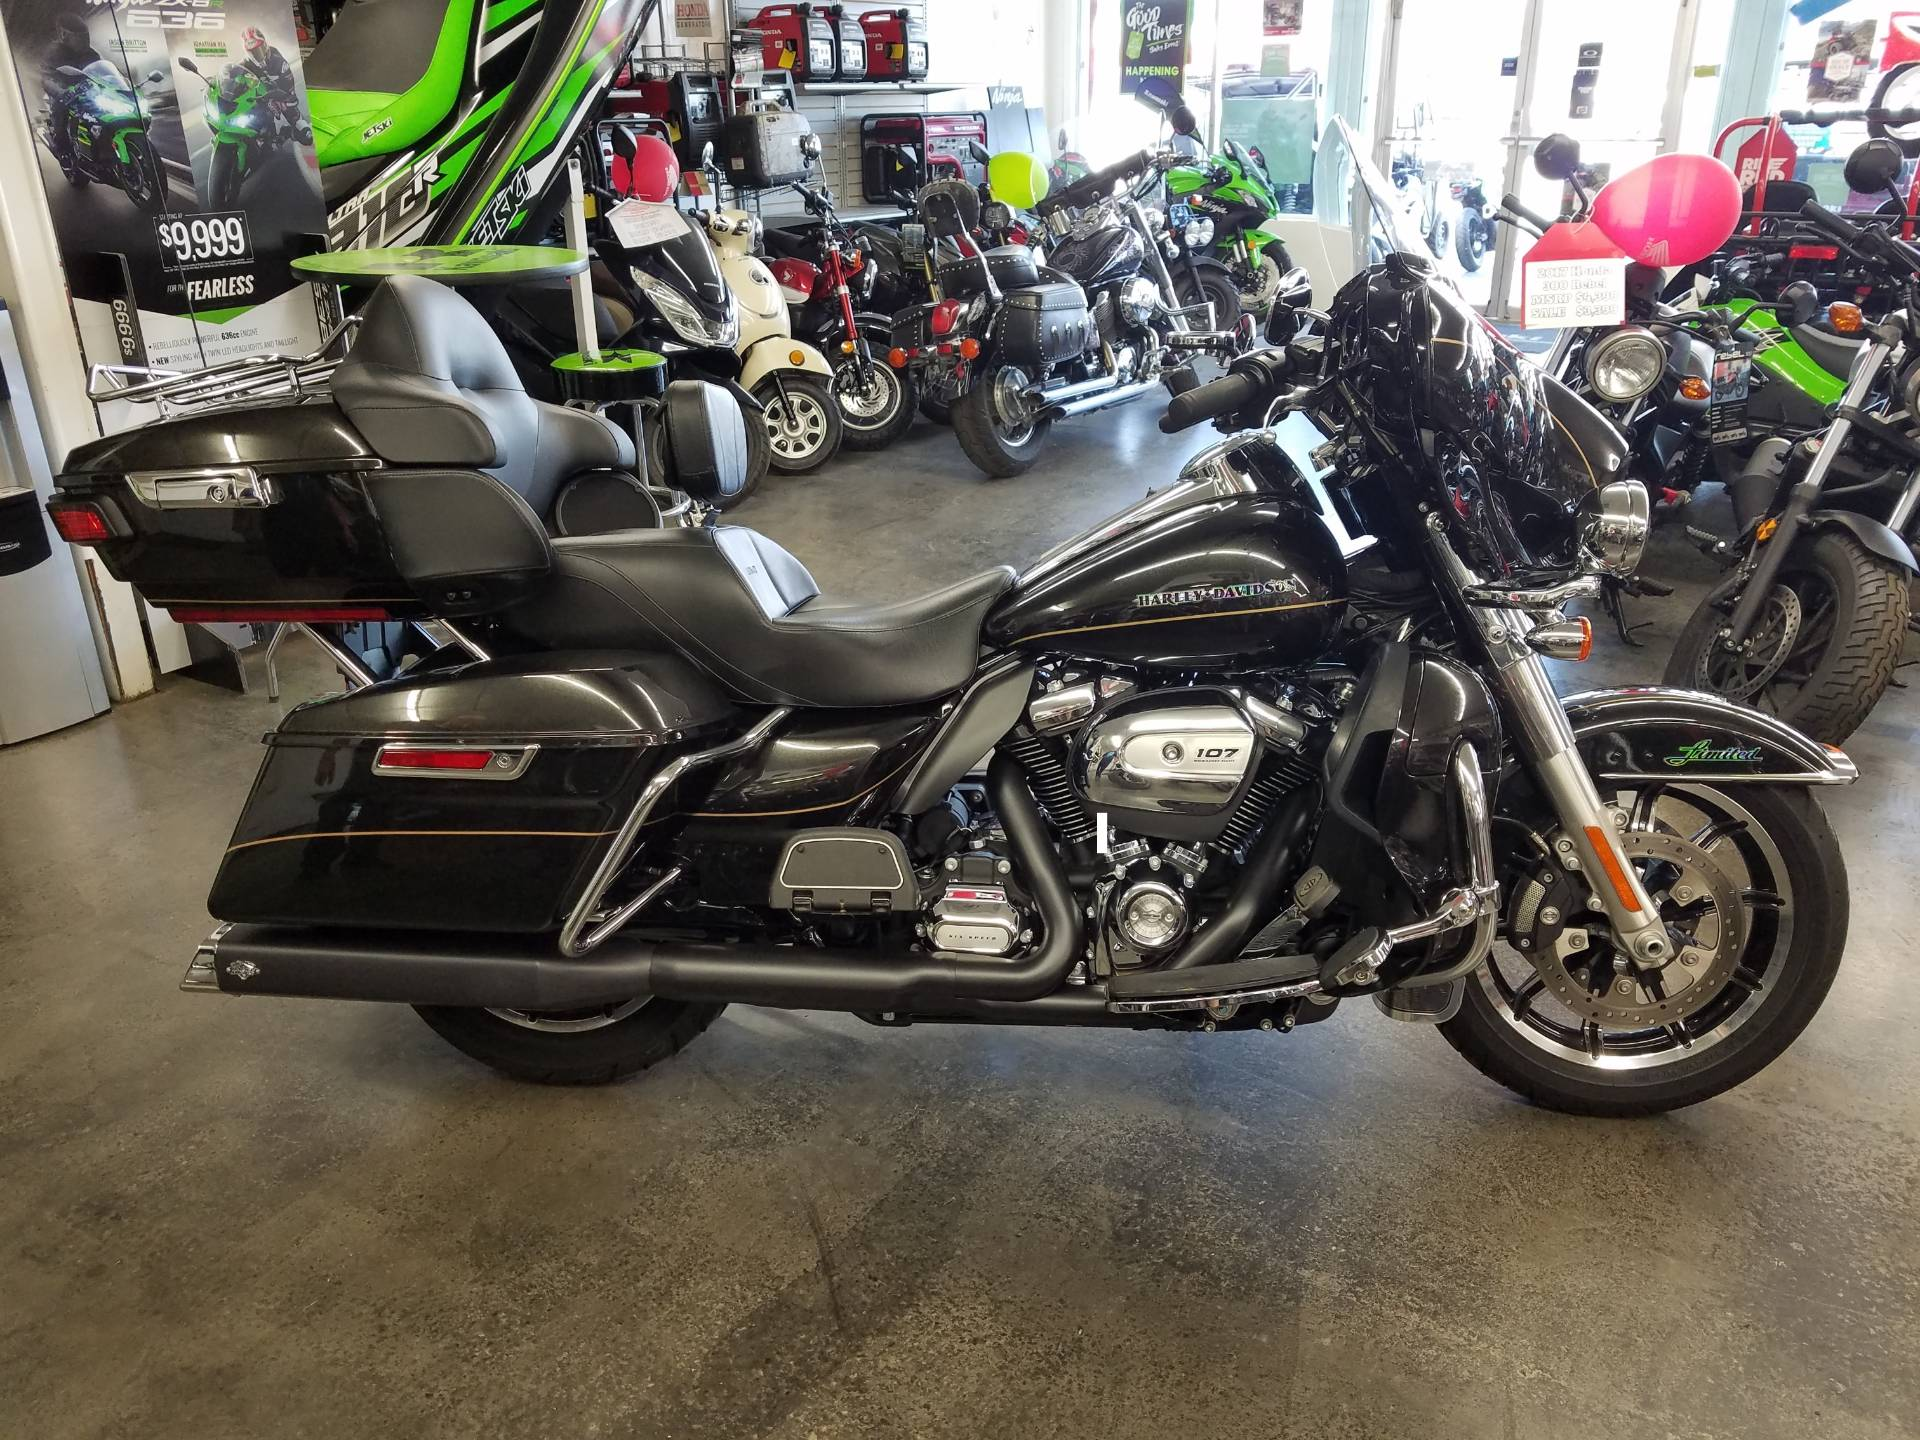 2017 Harley Davidson Ultra Limited In Fort Pierce Florida Photo 1